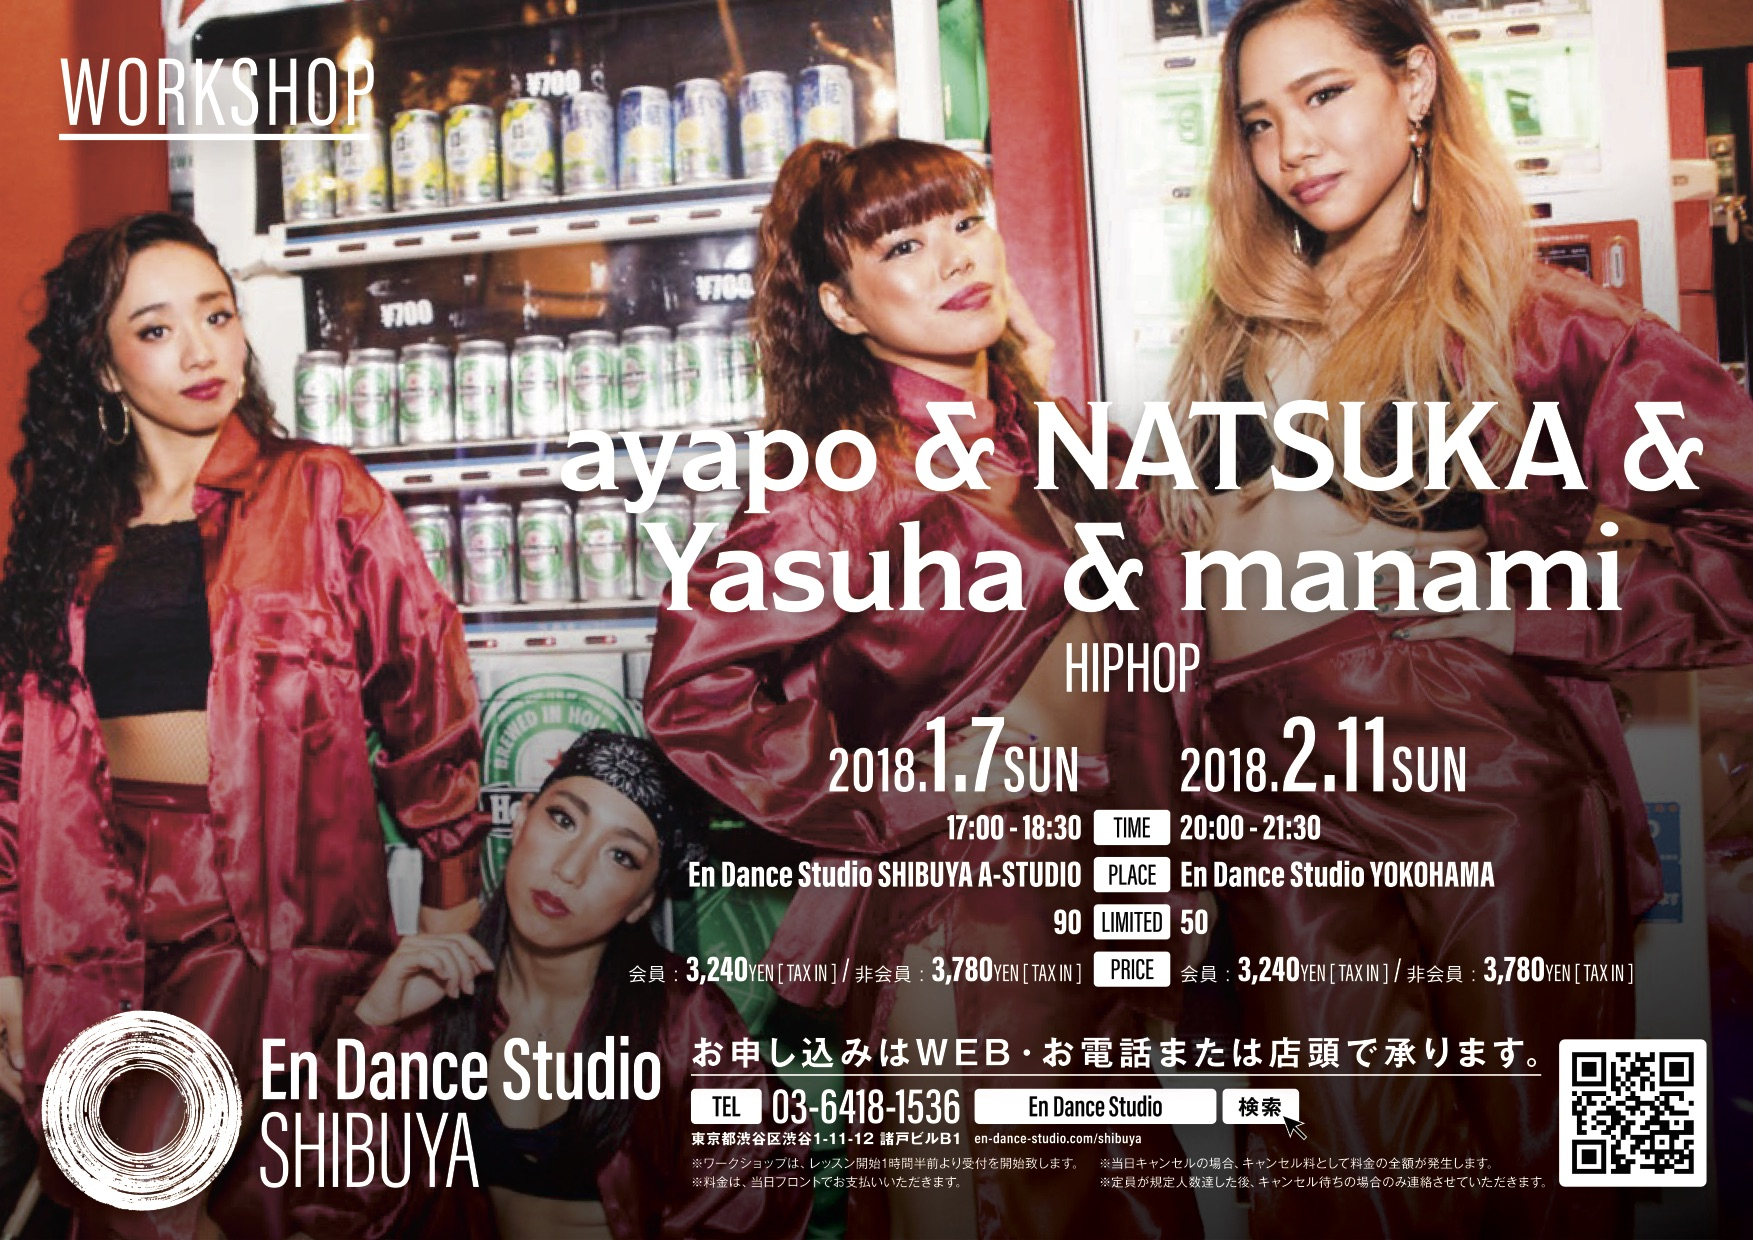 Ae408 ayapo&NATSUKA&Yasuha&manami